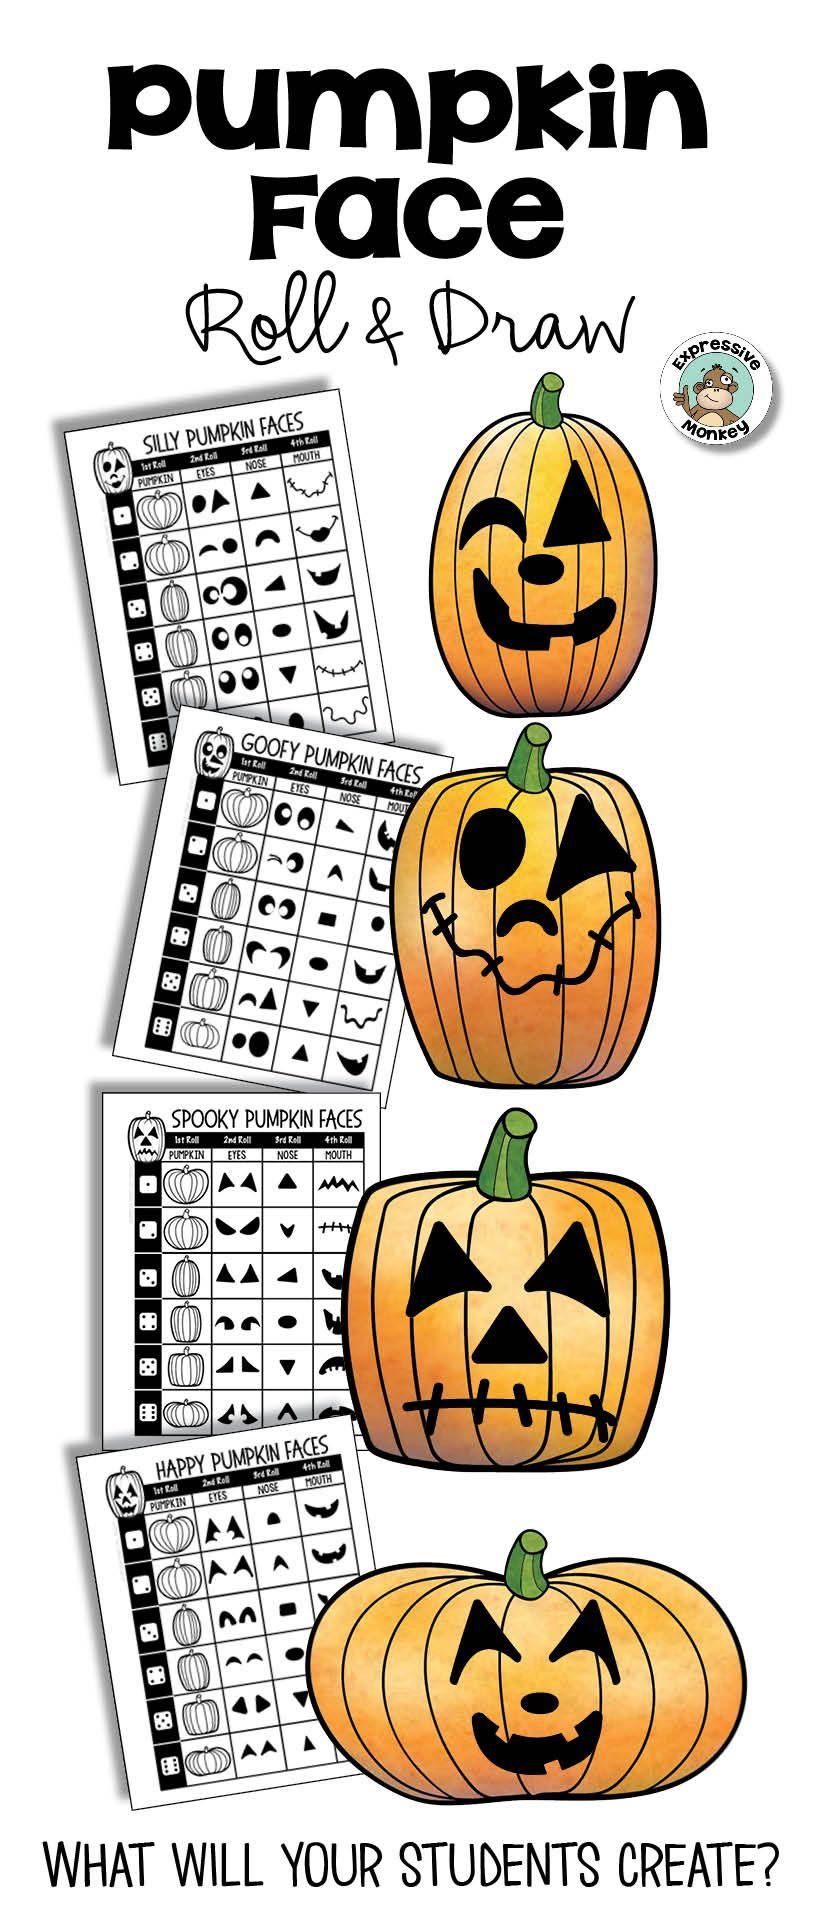 Halloween Activity Jack O Lantern Drawing Art Project Pumpkin Faces Lantern Drawing Jack O Lantern